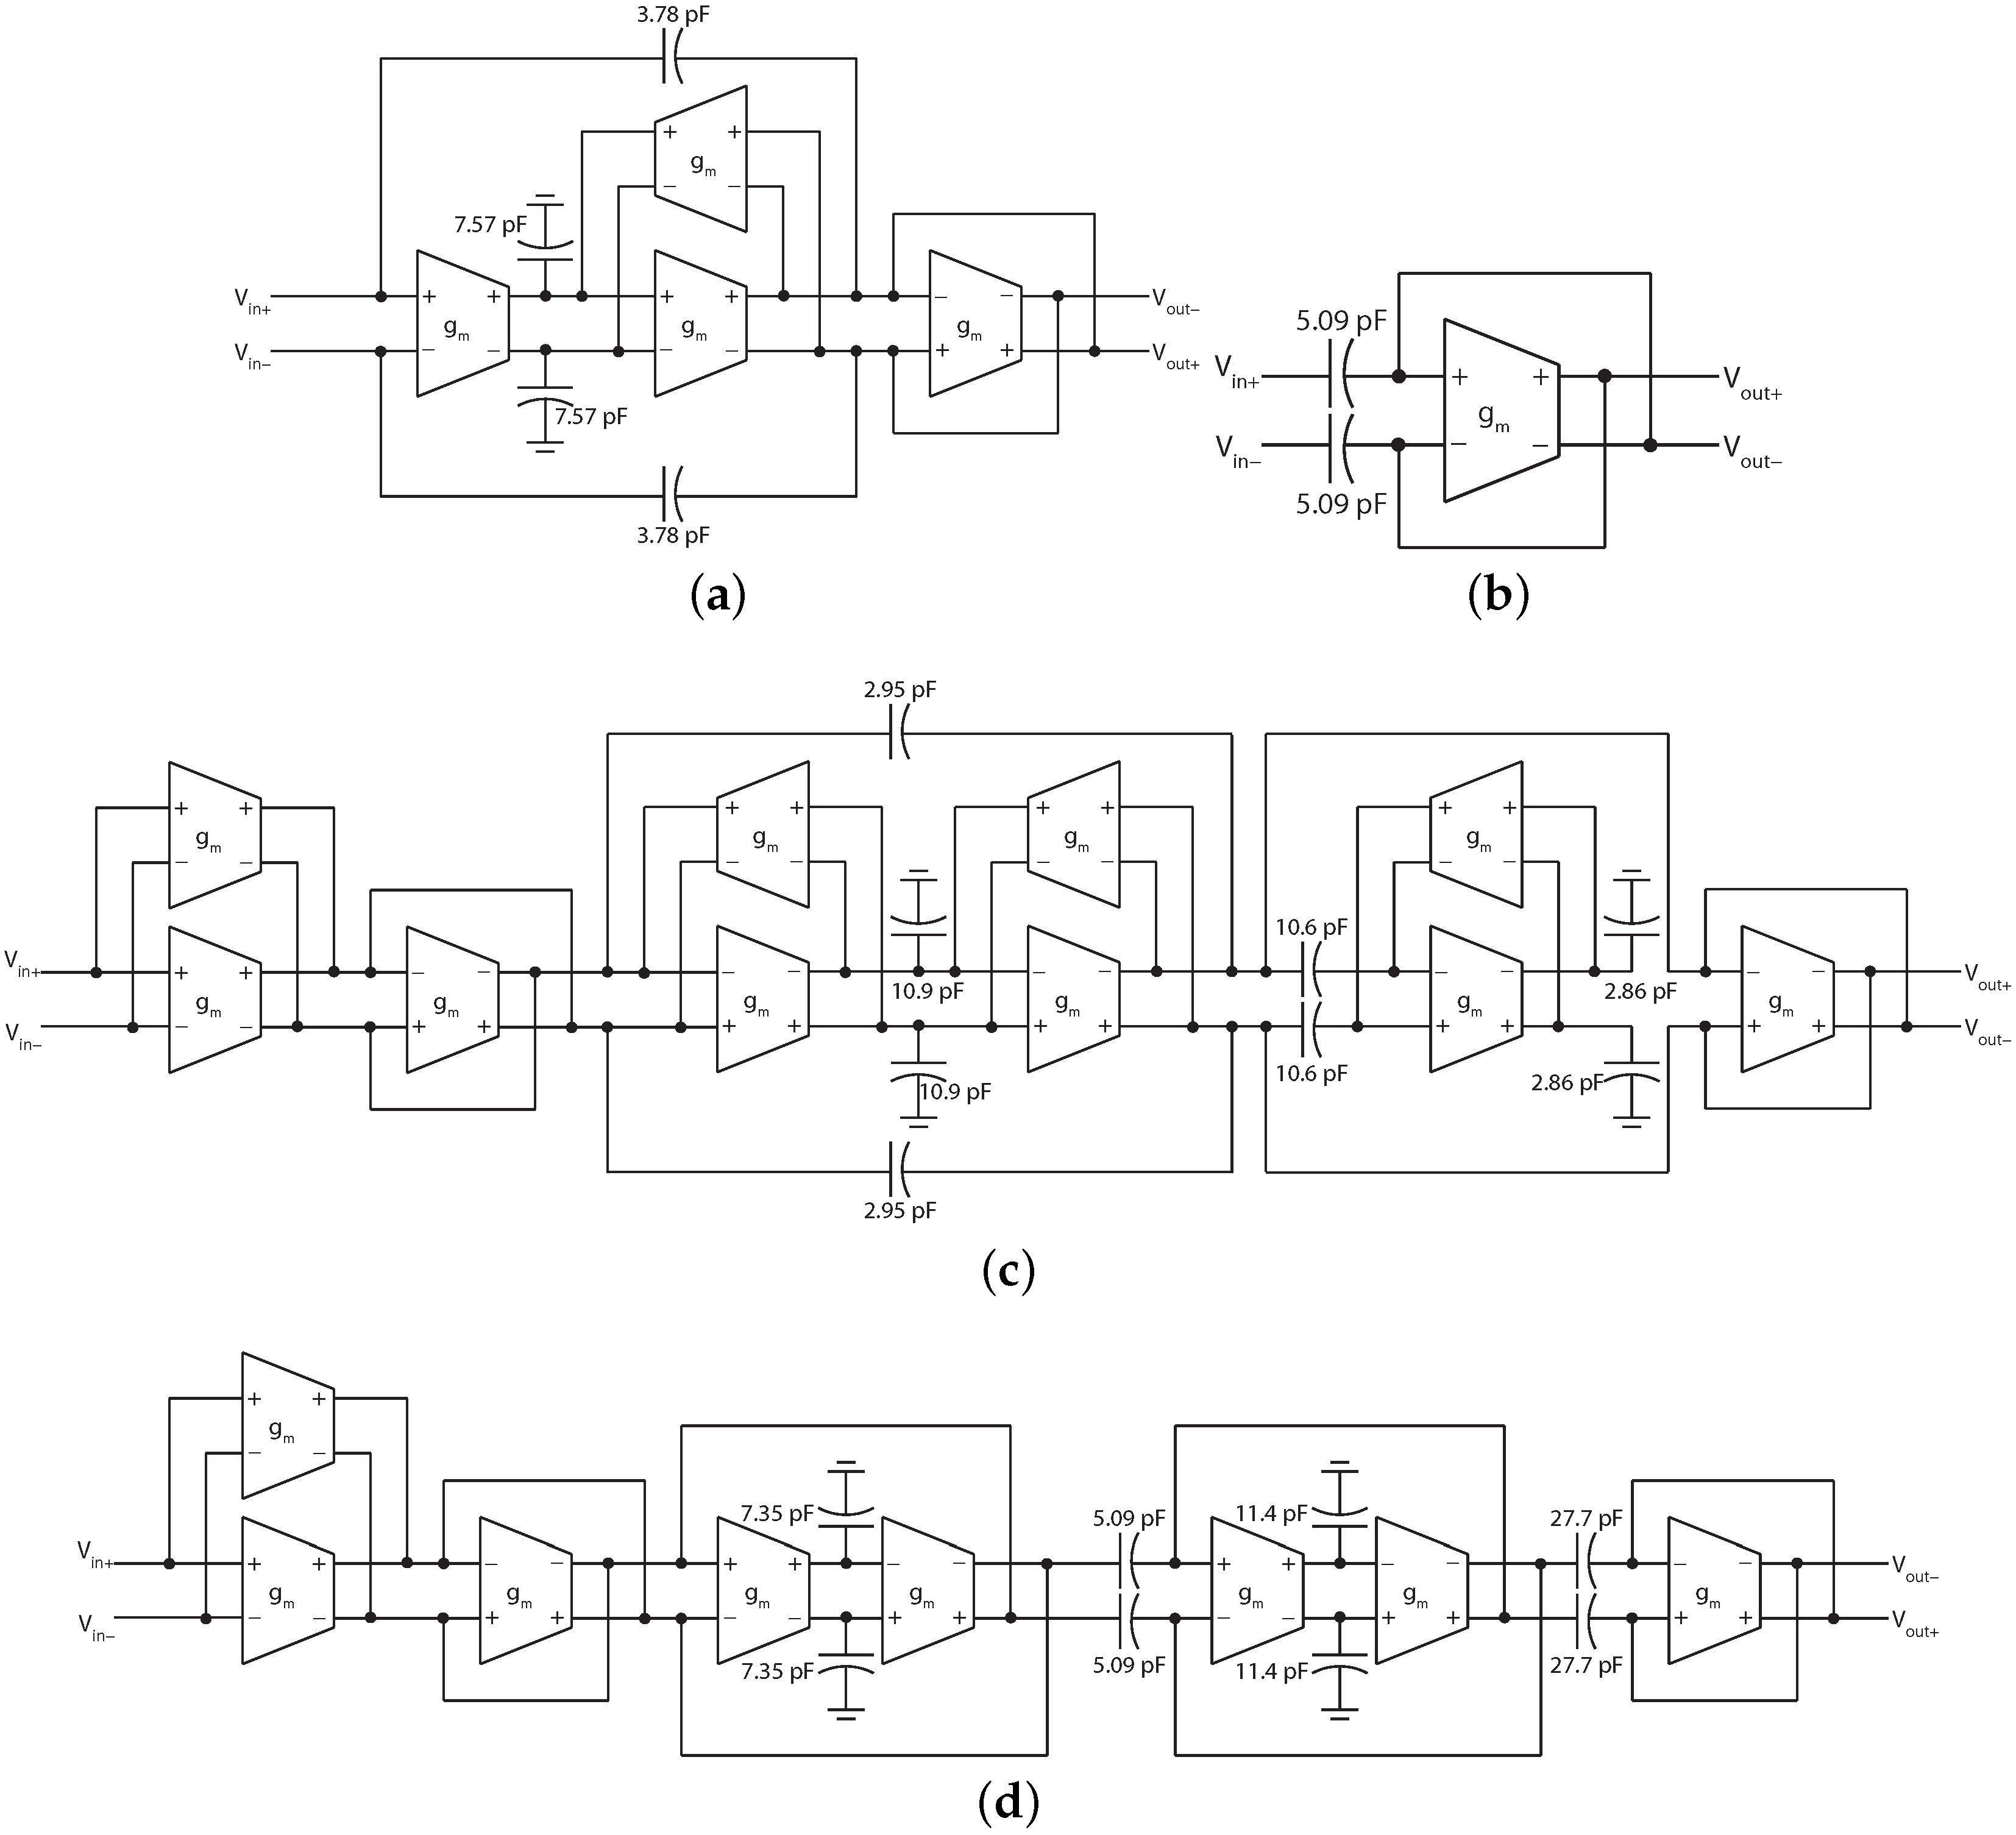 western unimount wiring diagram controler western plow